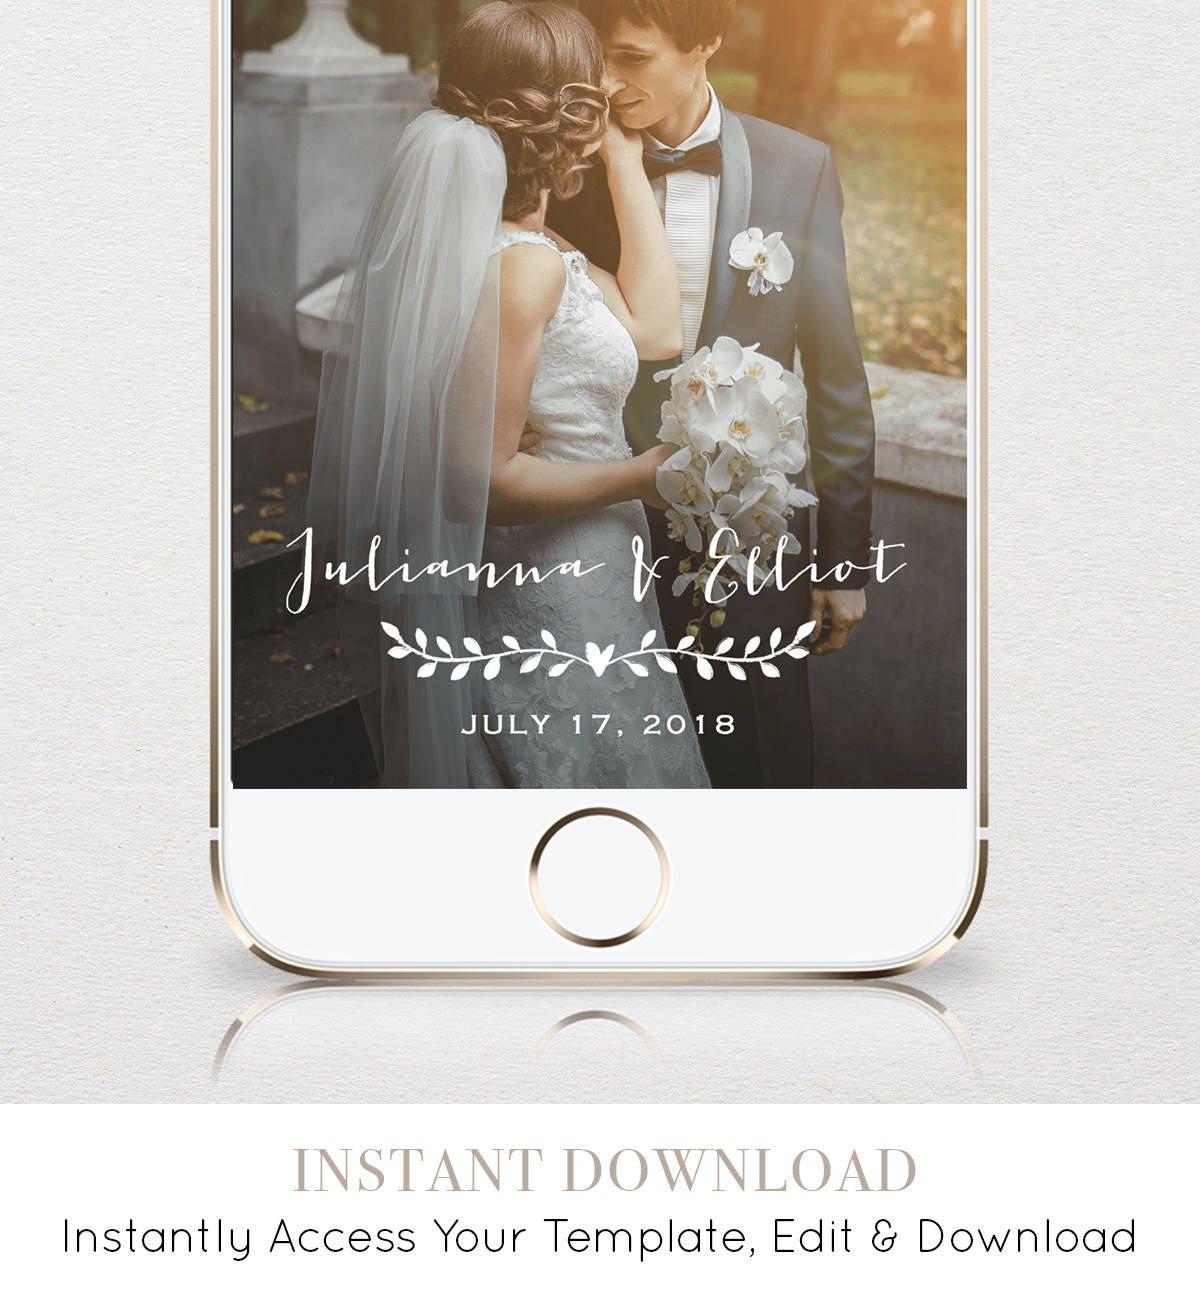 wedding snapchat geofilter custom geofilter rustic snapchat filter 100 editable template. Black Bedroom Furniture Sets. Home Design Ideas